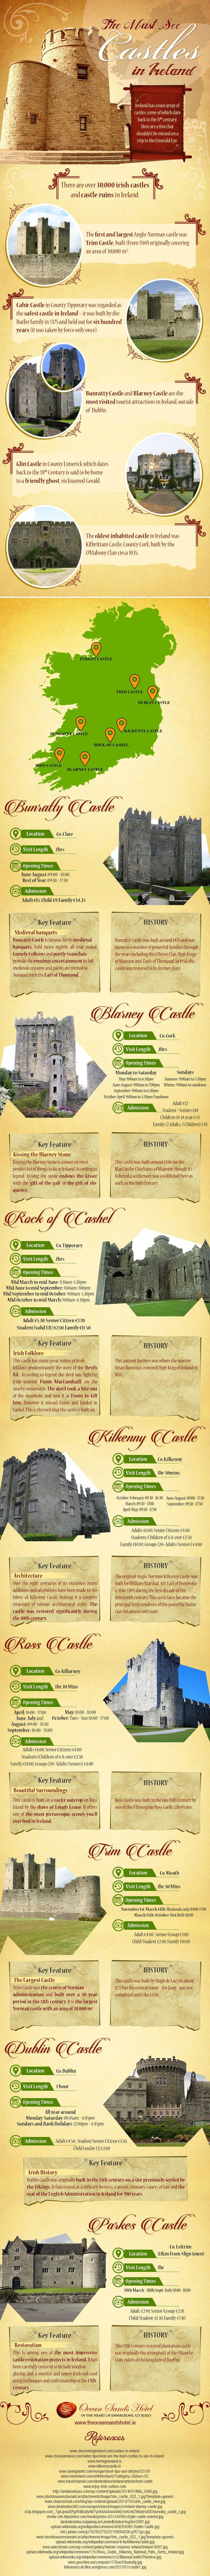 Most popular #castles in #Ireland + Lough Eske Castle #Donegal!